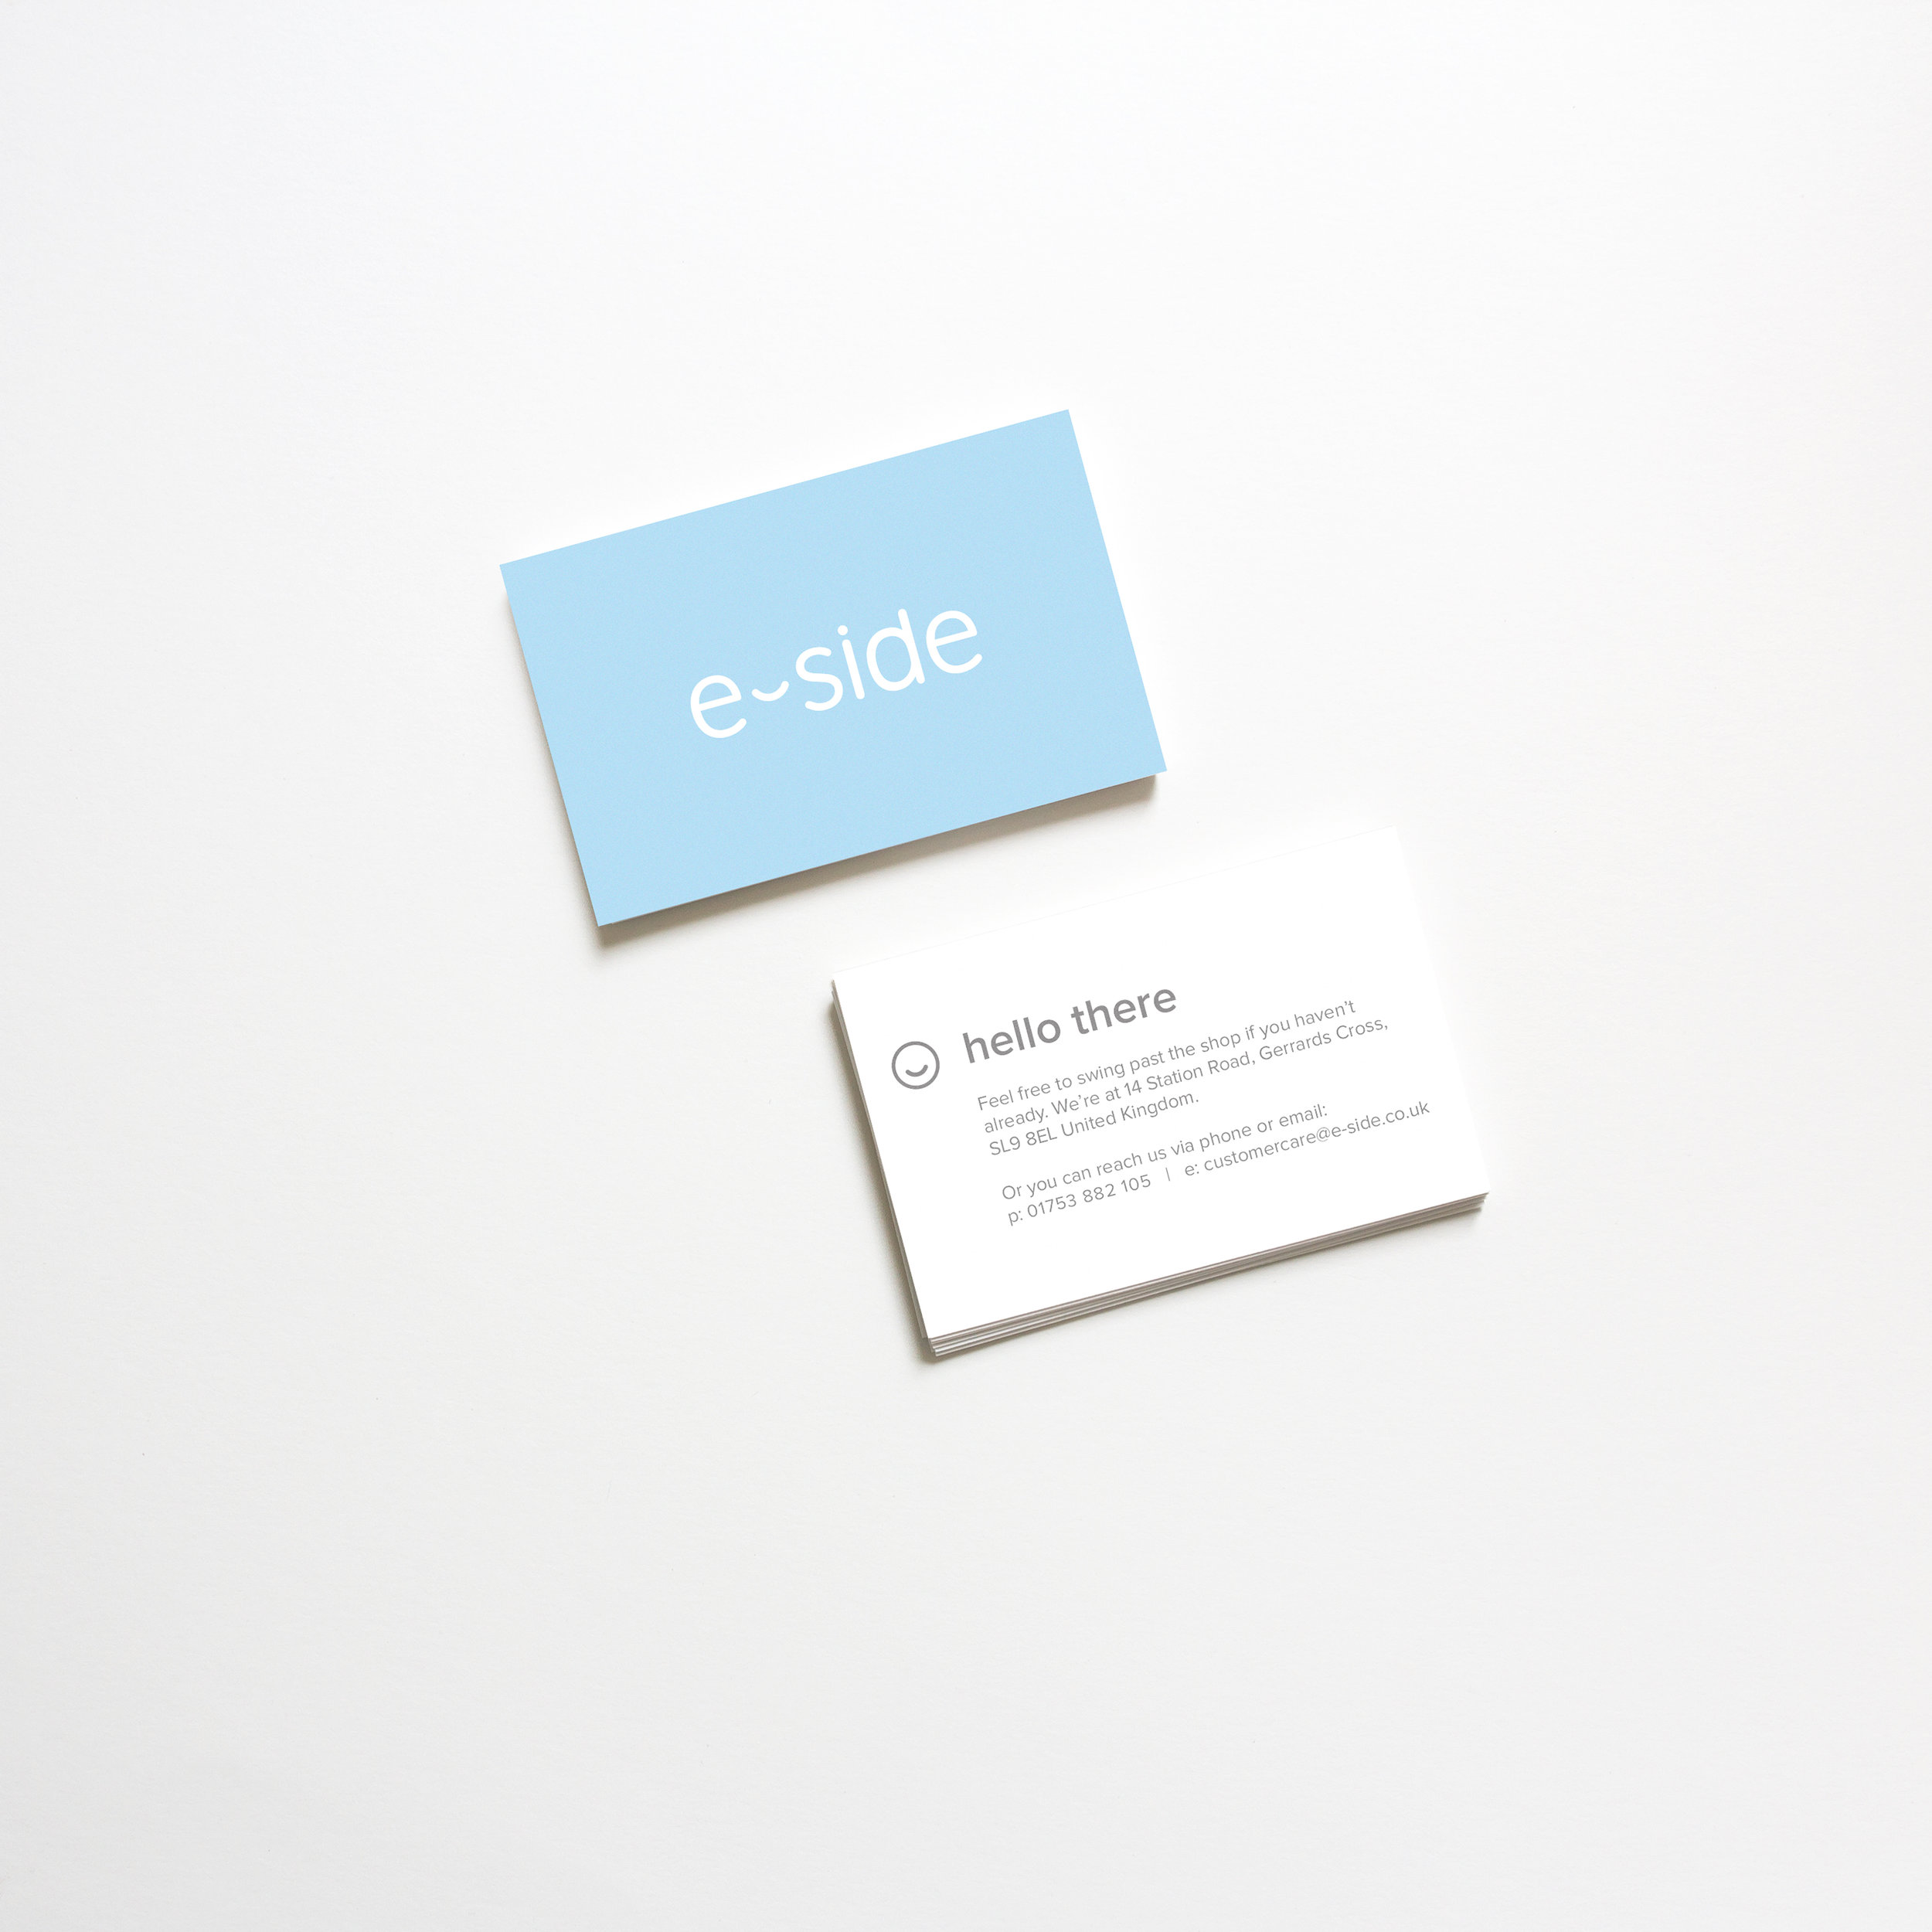 furniture-shop-branding.jpg